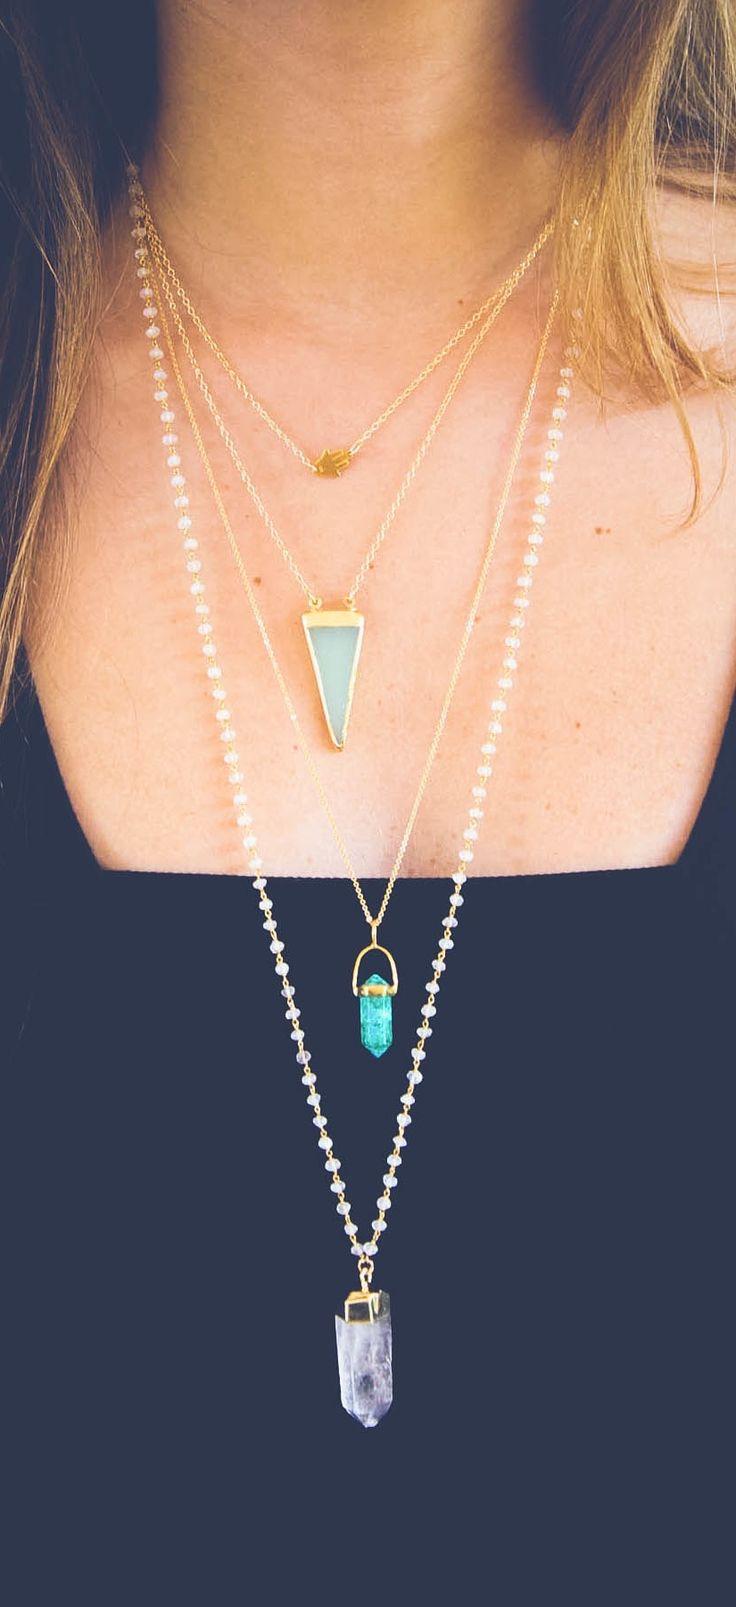 layered chains | kei jewelry...beach day perfect